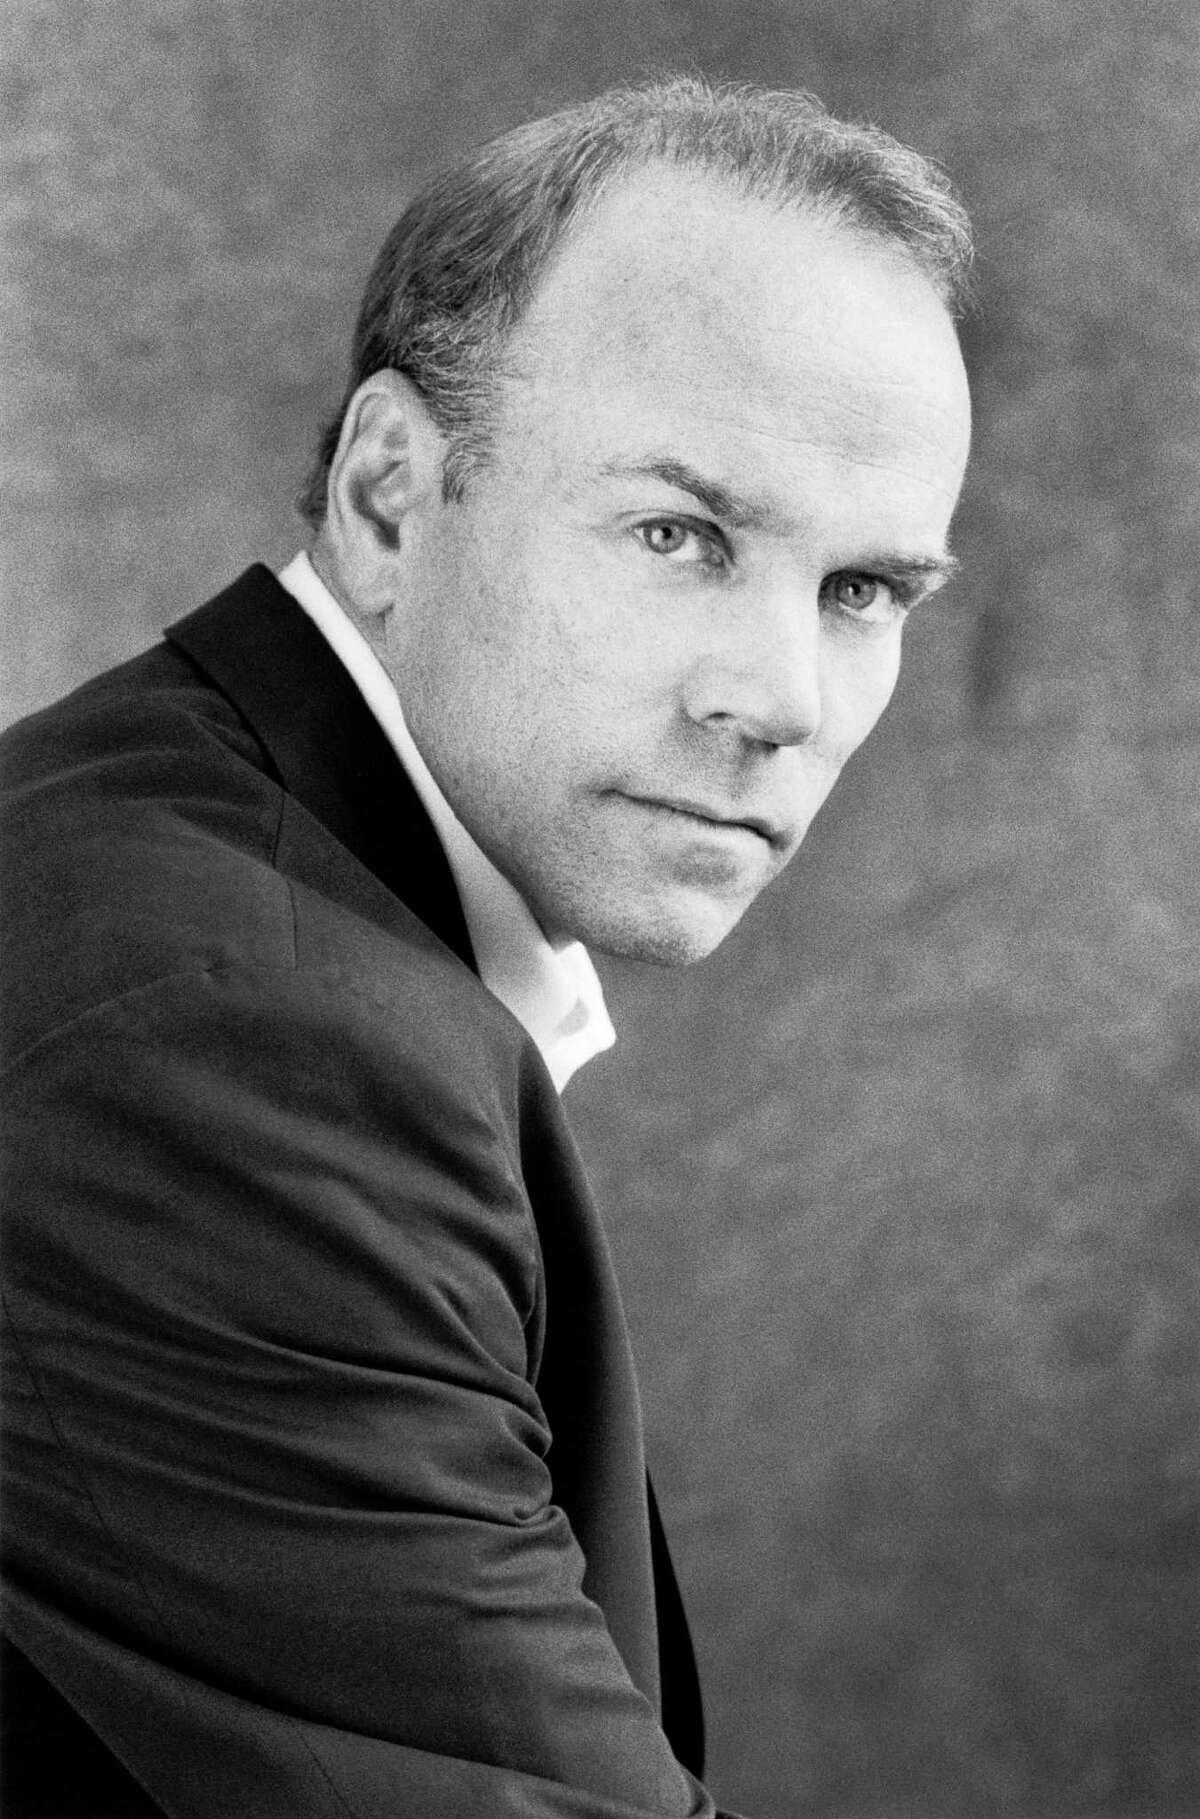 James Donovan, author of